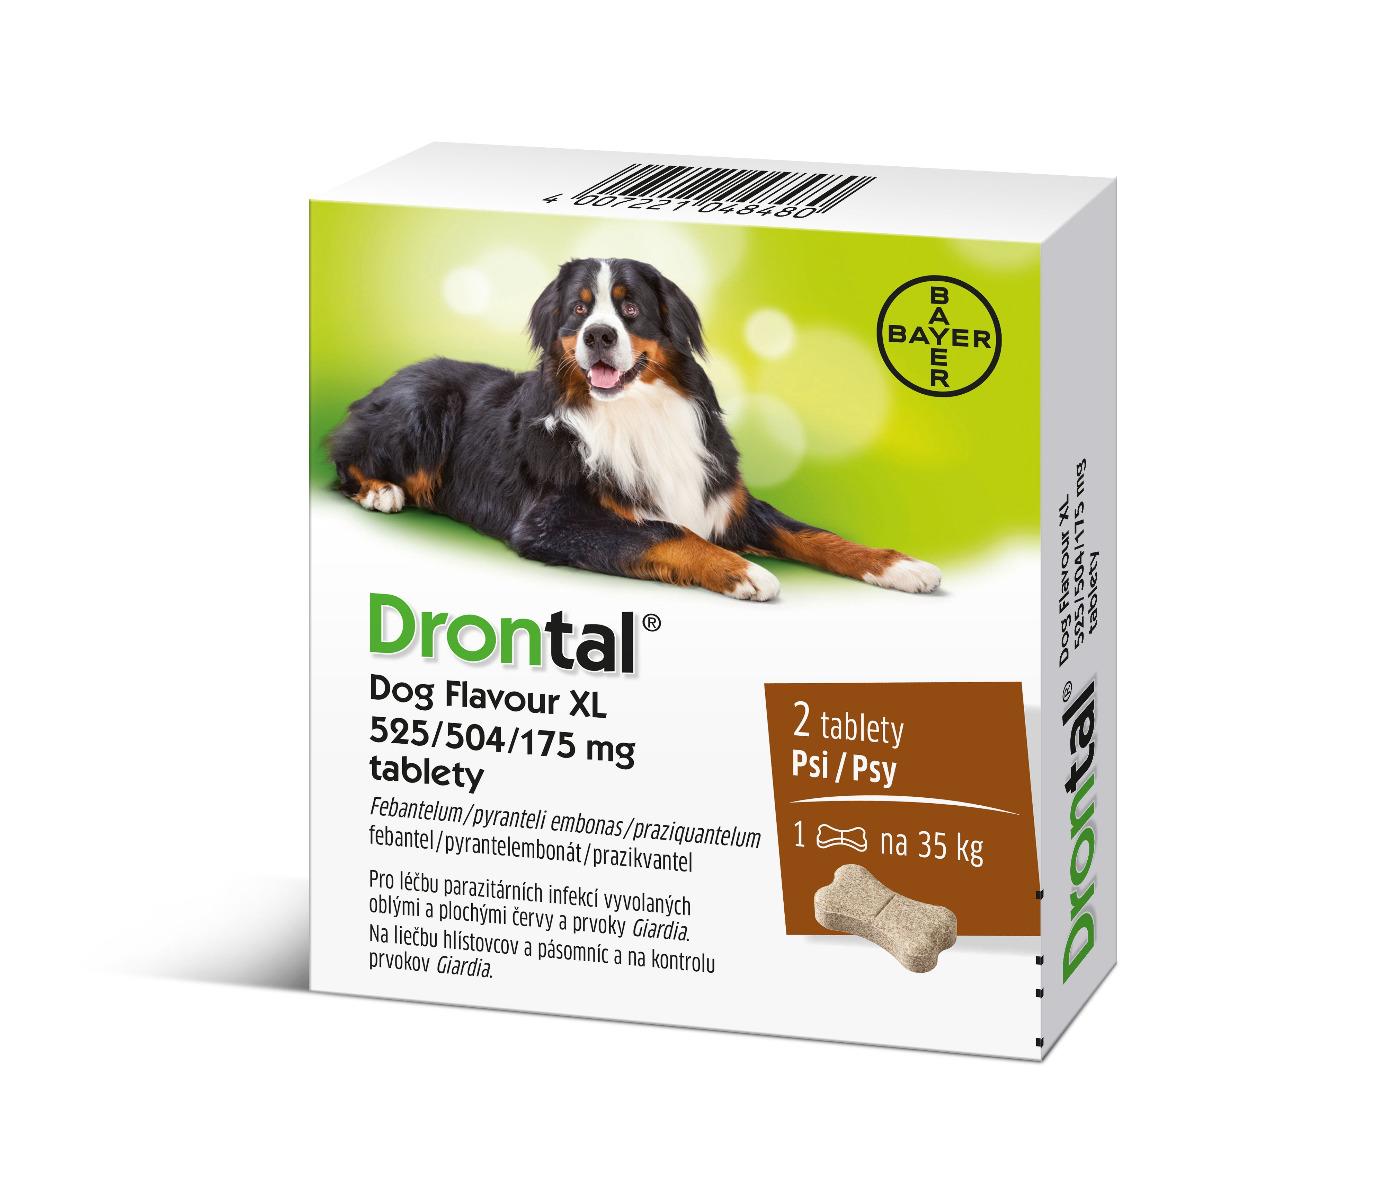 E-shop Drontal Dog Flavour XL 525/504/175 mg 2 tablety